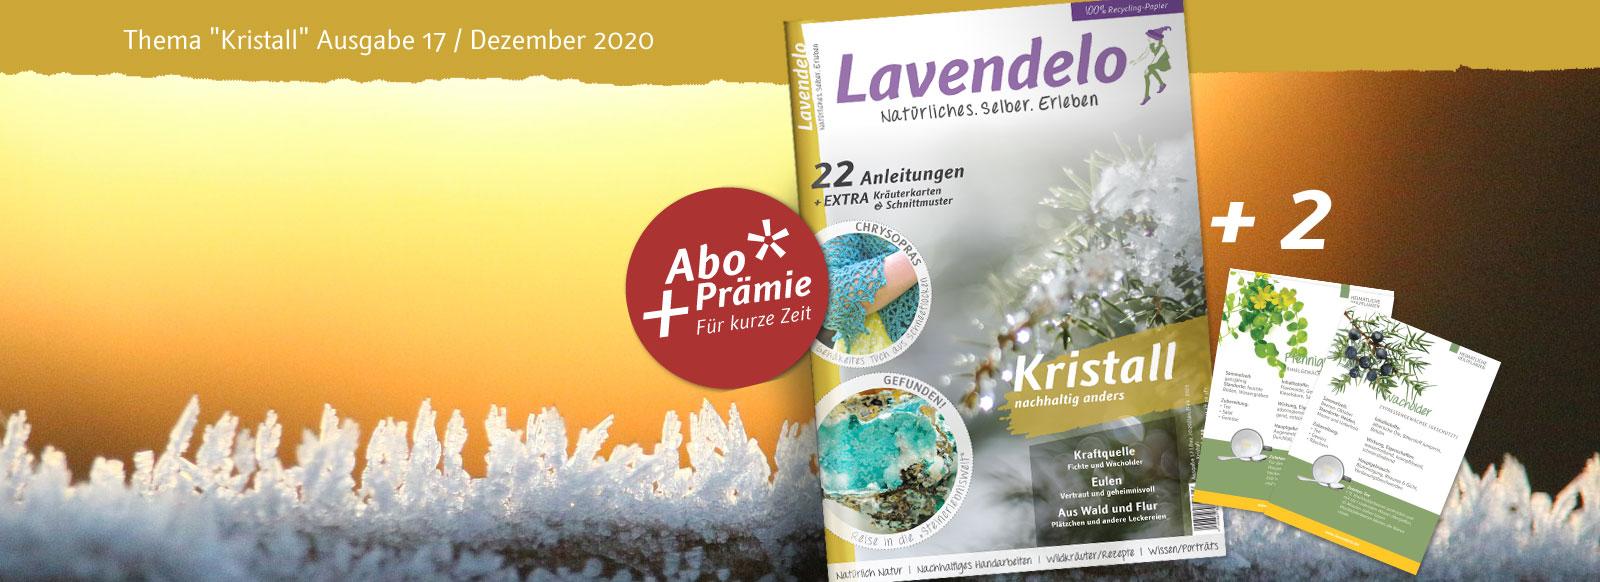 Kristall Lavendelo 17 2020/21